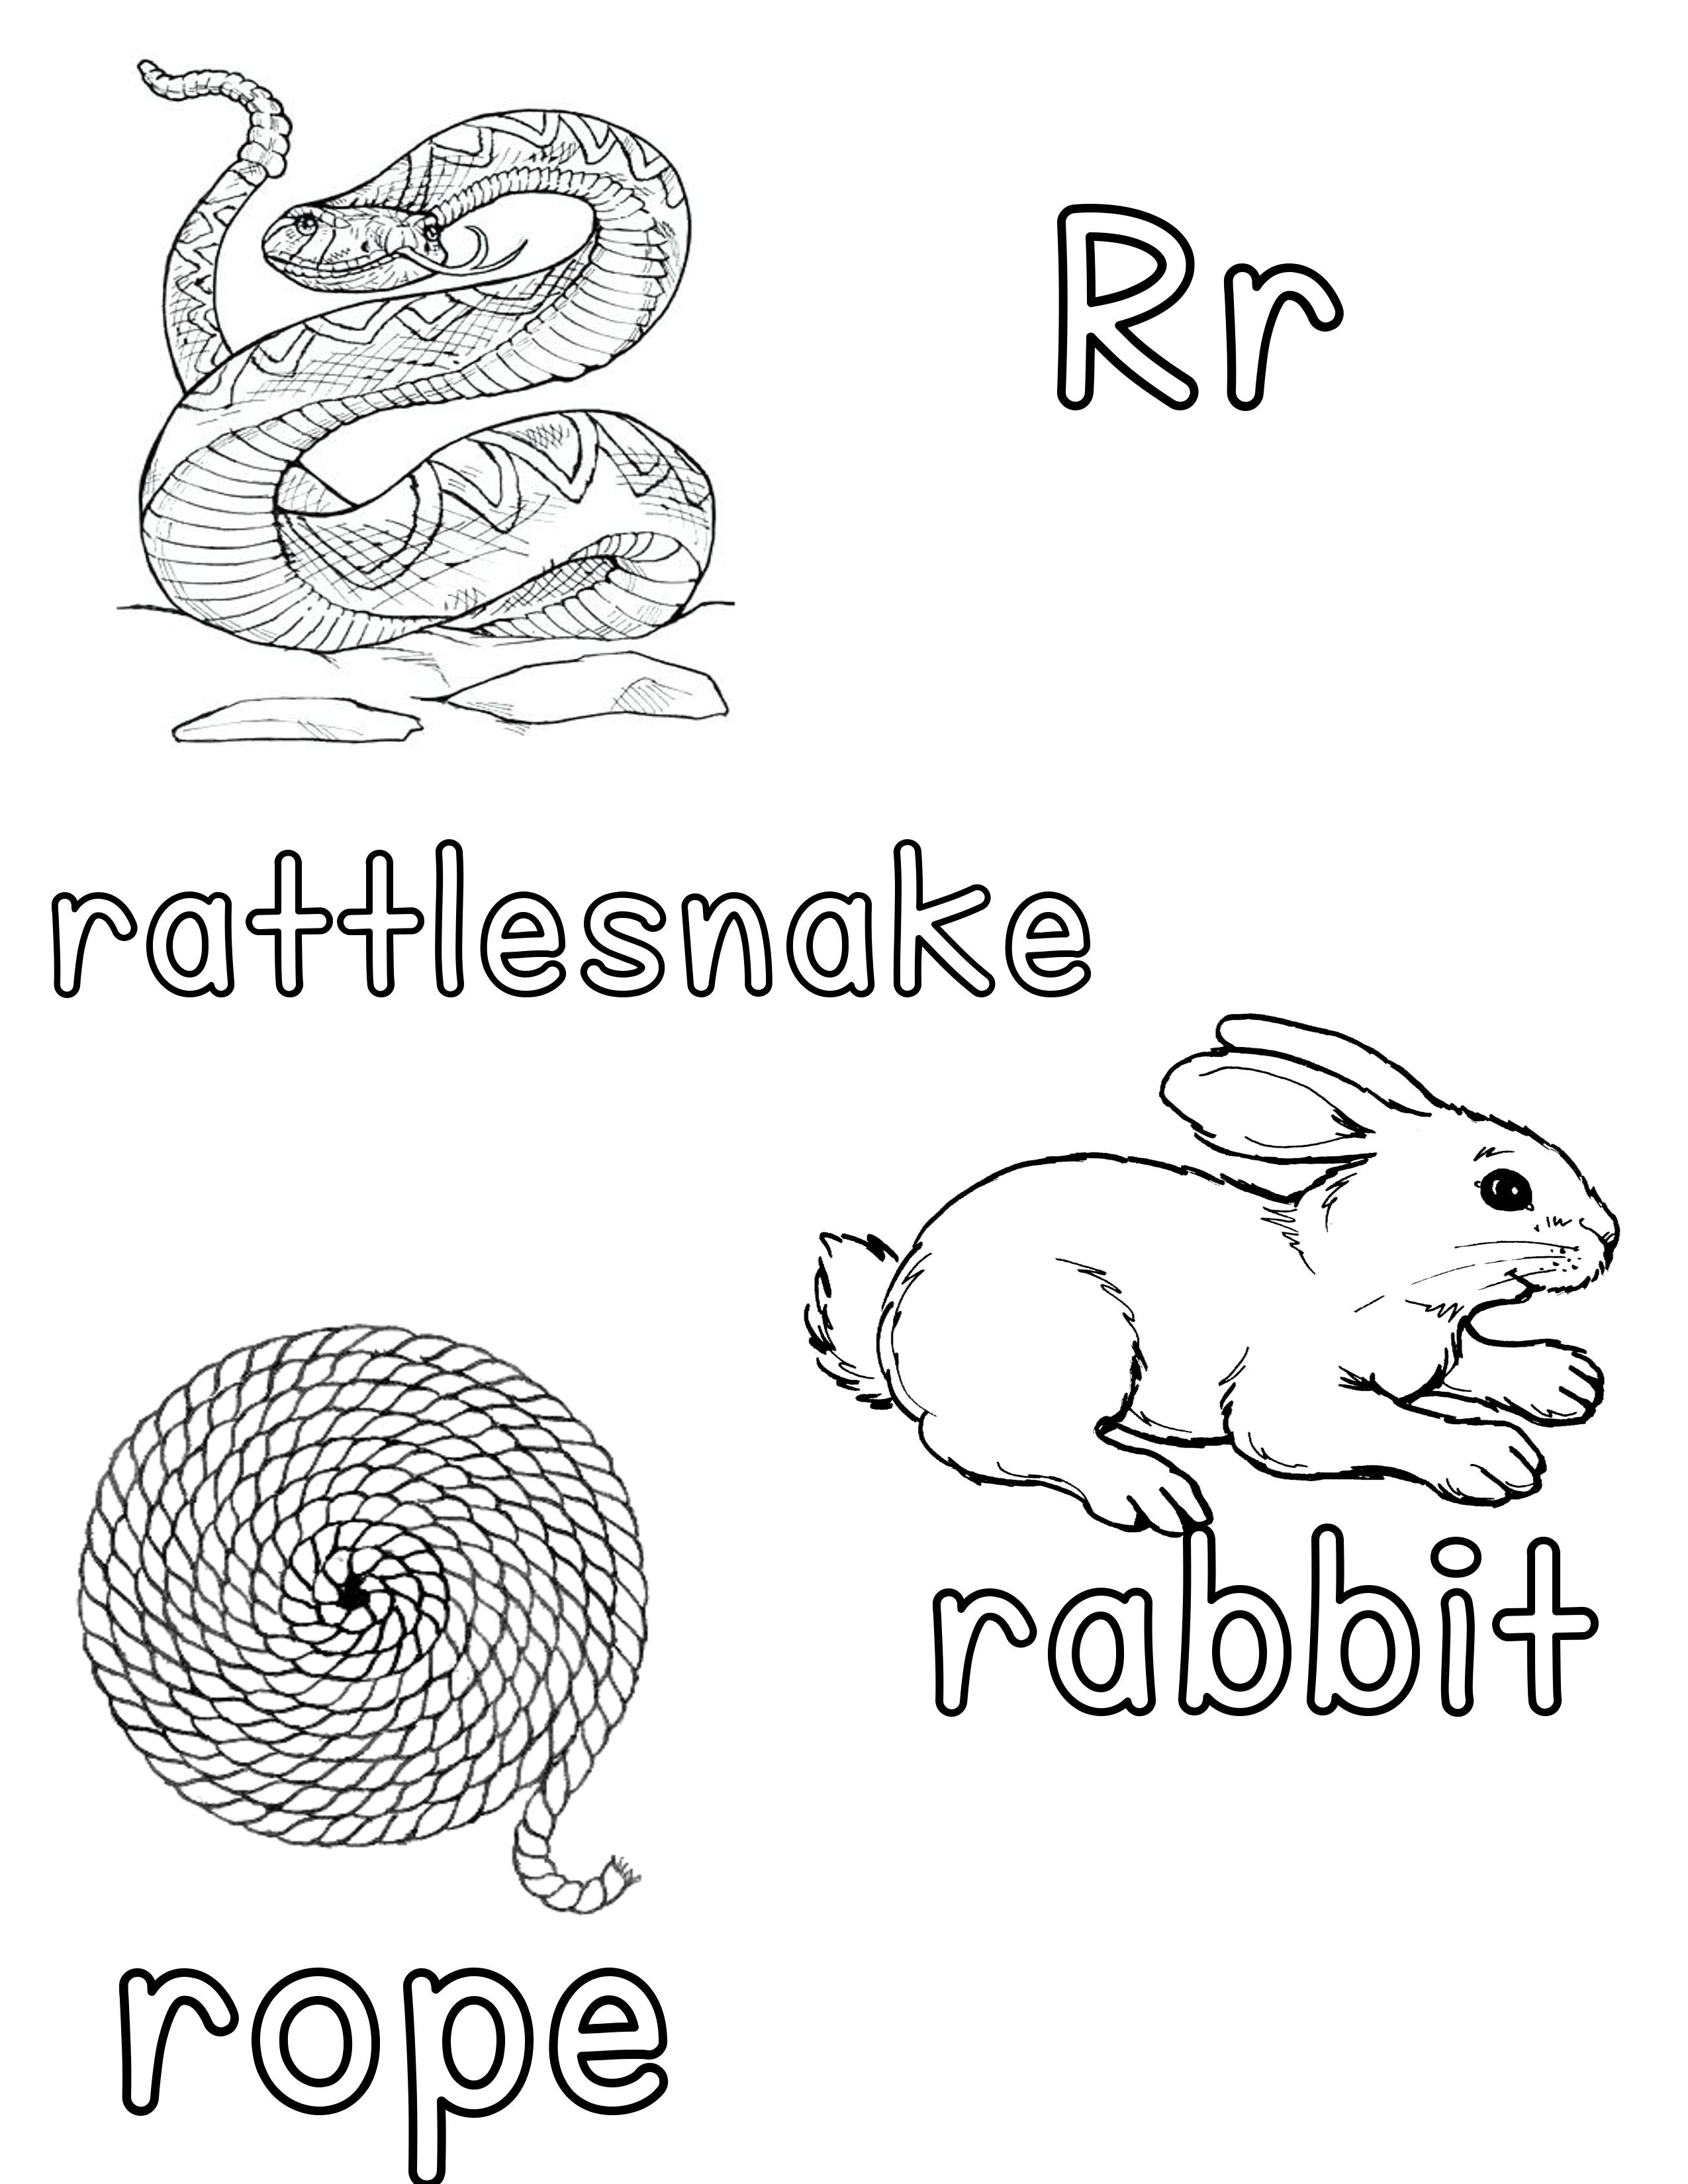 Phonetic Rr Coloring Sheet